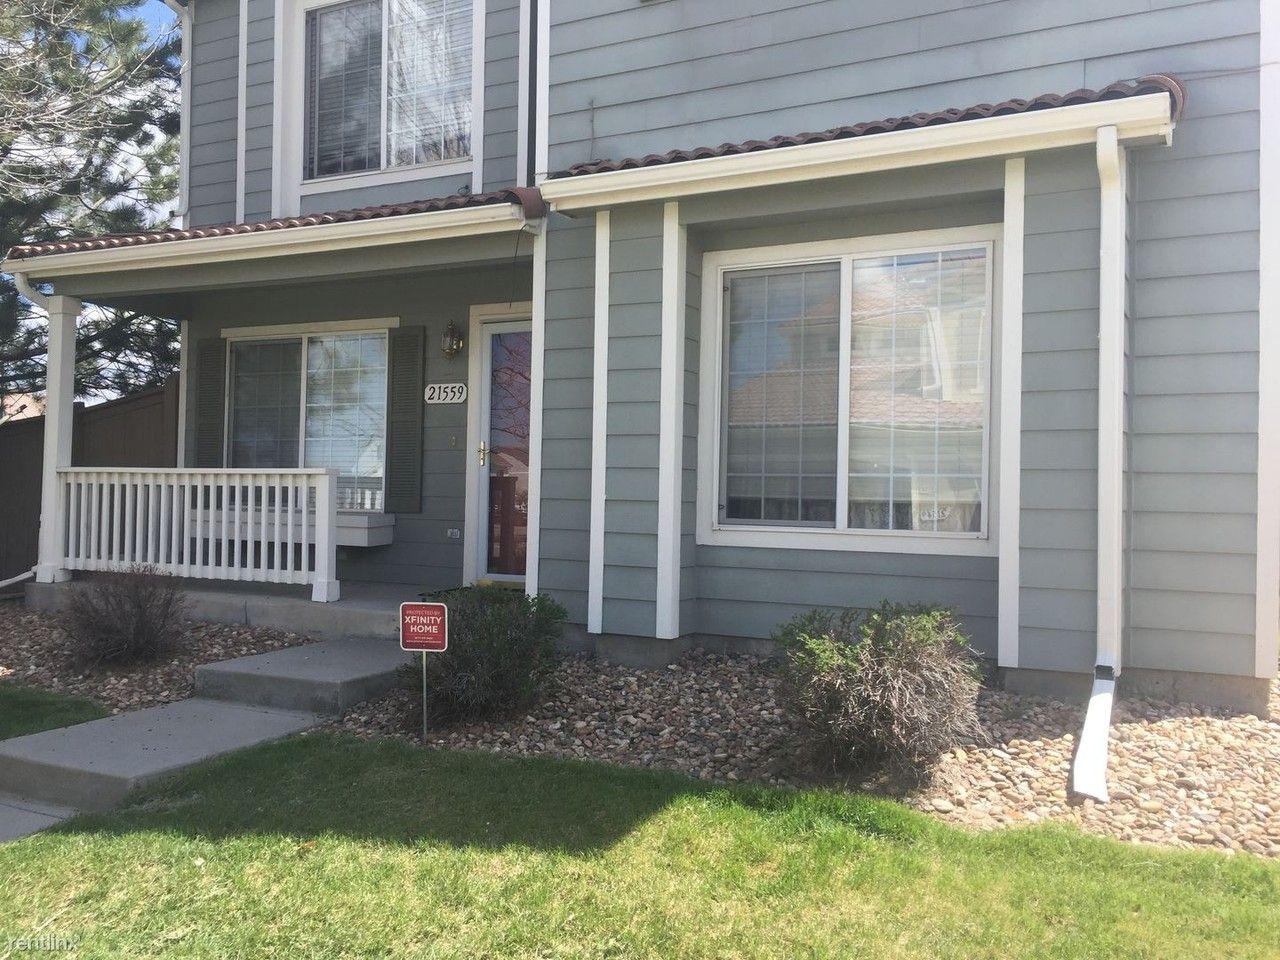 21559 E 47th Ave, Denver, CO 80249 3 Bedroom House for Rent for ...